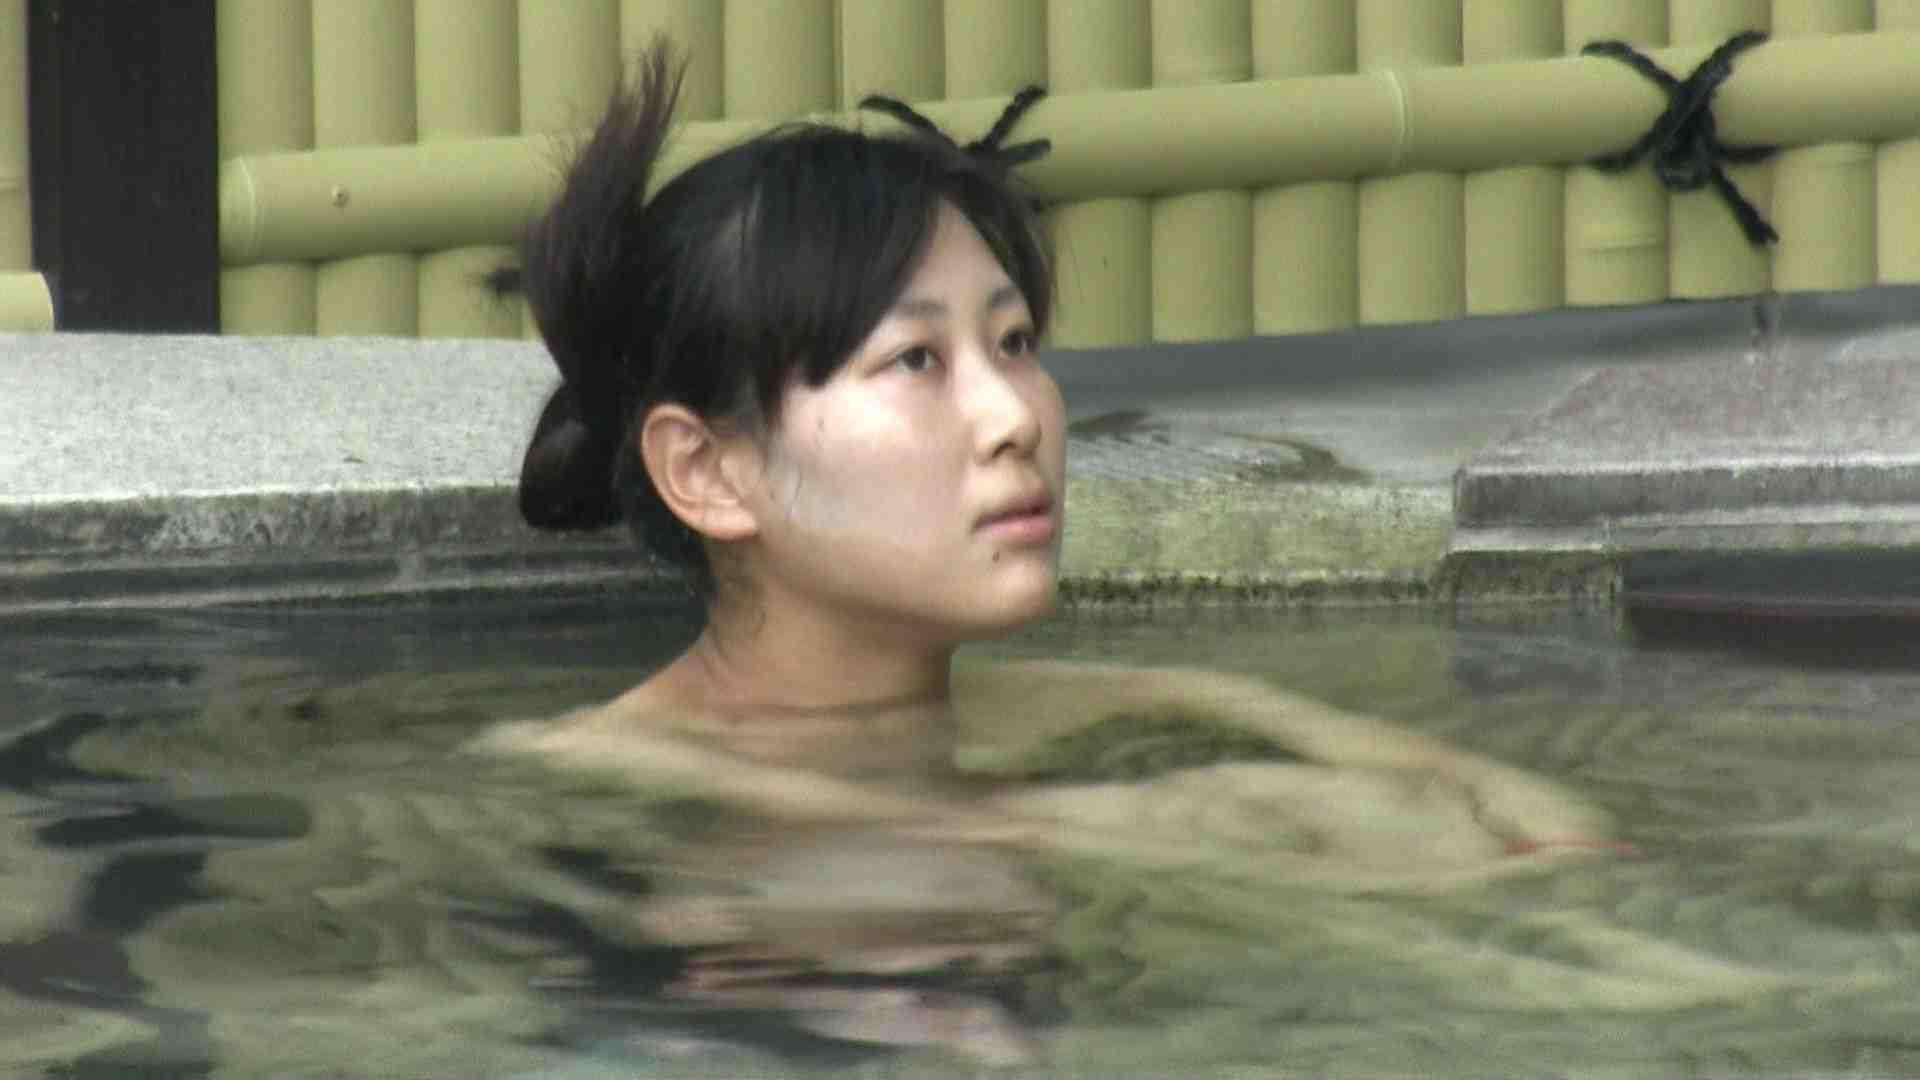 Aquaな露天風呂Vol.665 綺麗なOLたち  85枚 27